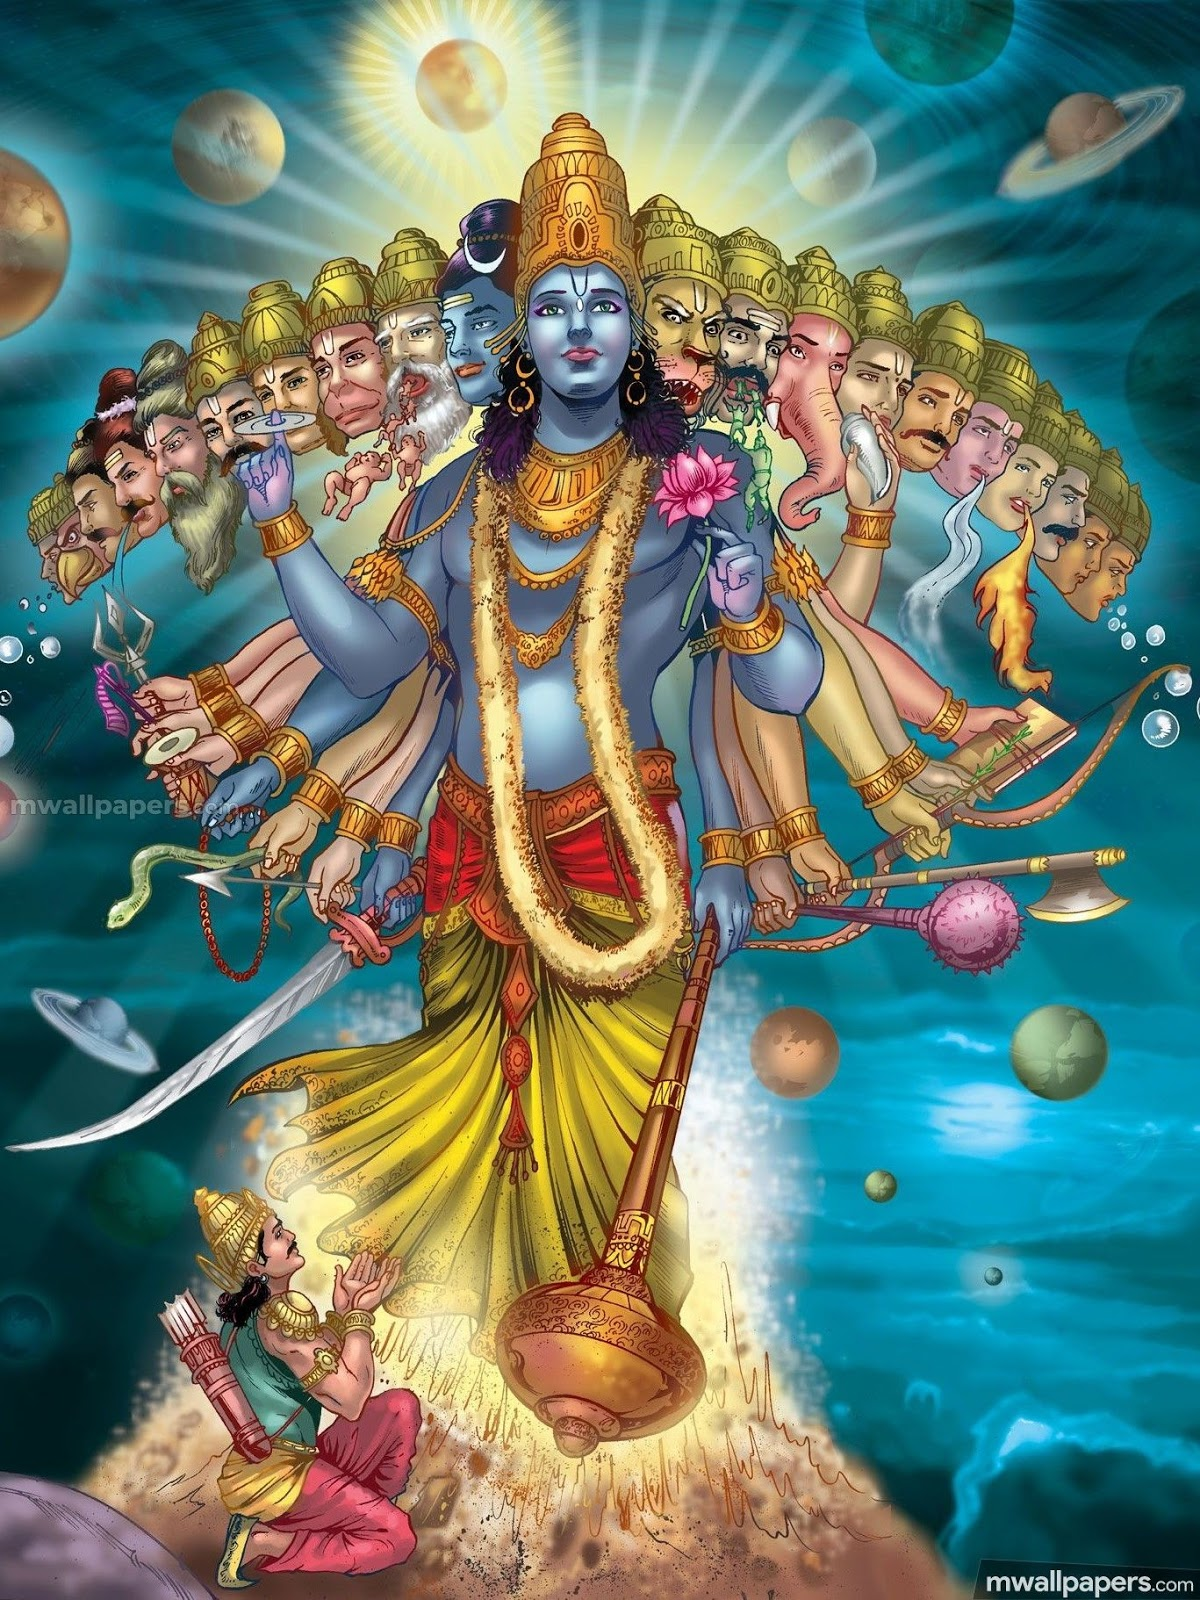 300 Lord Hanuman Ji Full Hd Images Pics हन म न फ ट Free Download 2020 Good Morning Images 2020